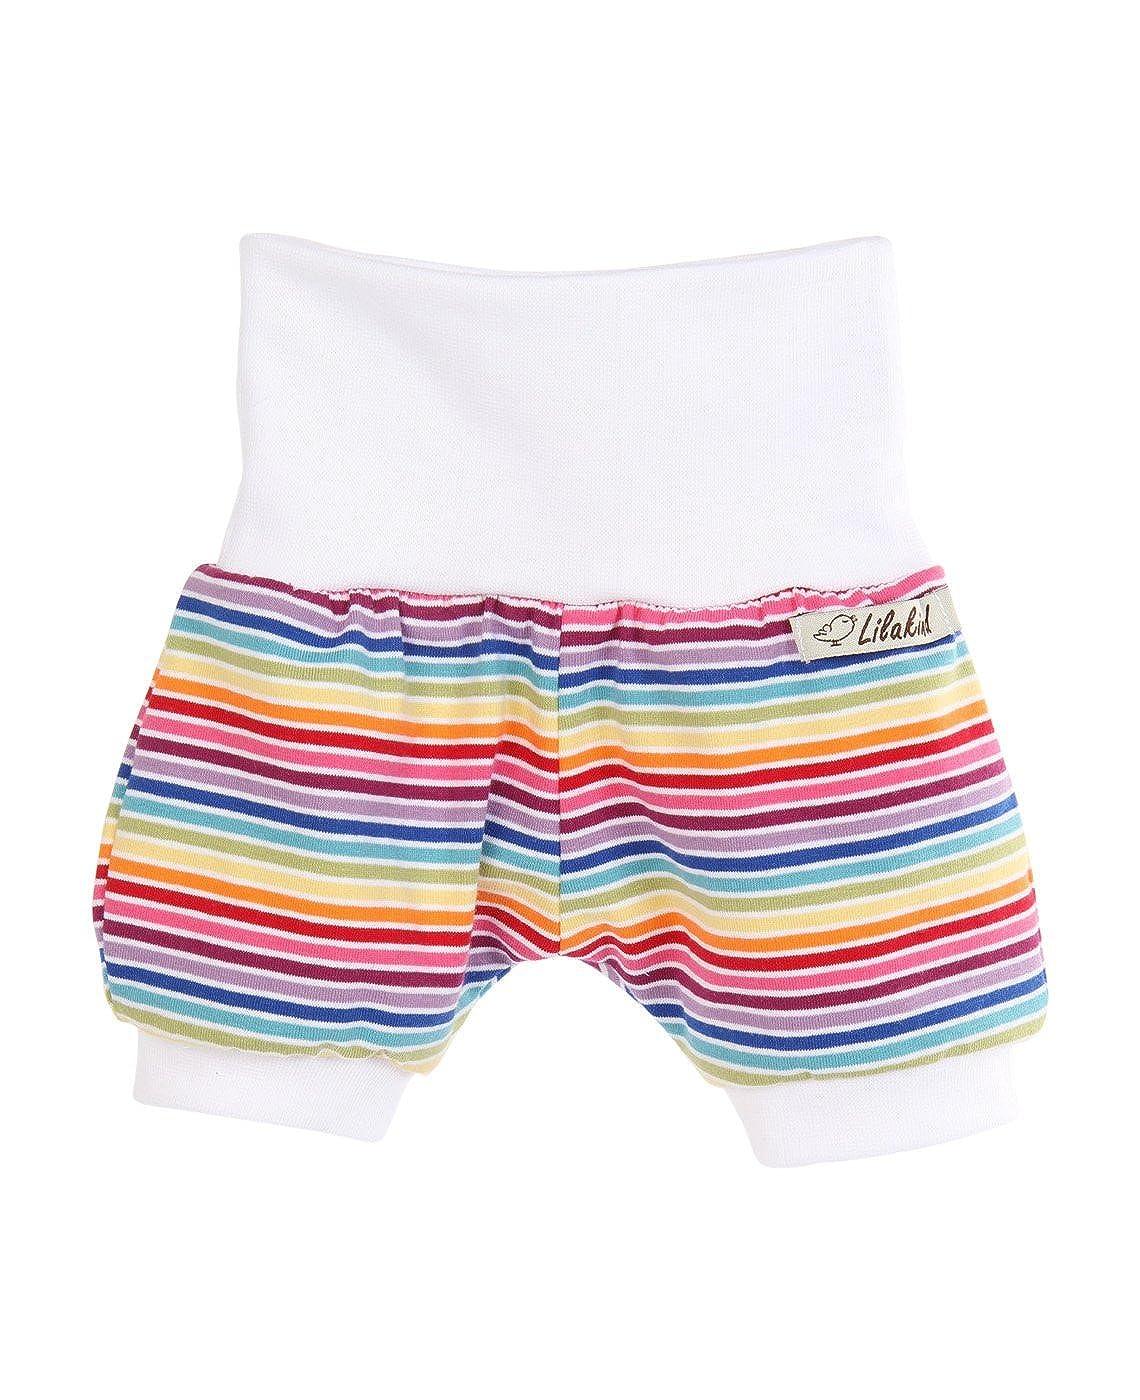 Lilakind Kurze Pumphose Shorts Buxe Sommerhose Punkte Hergestellt in Berlin